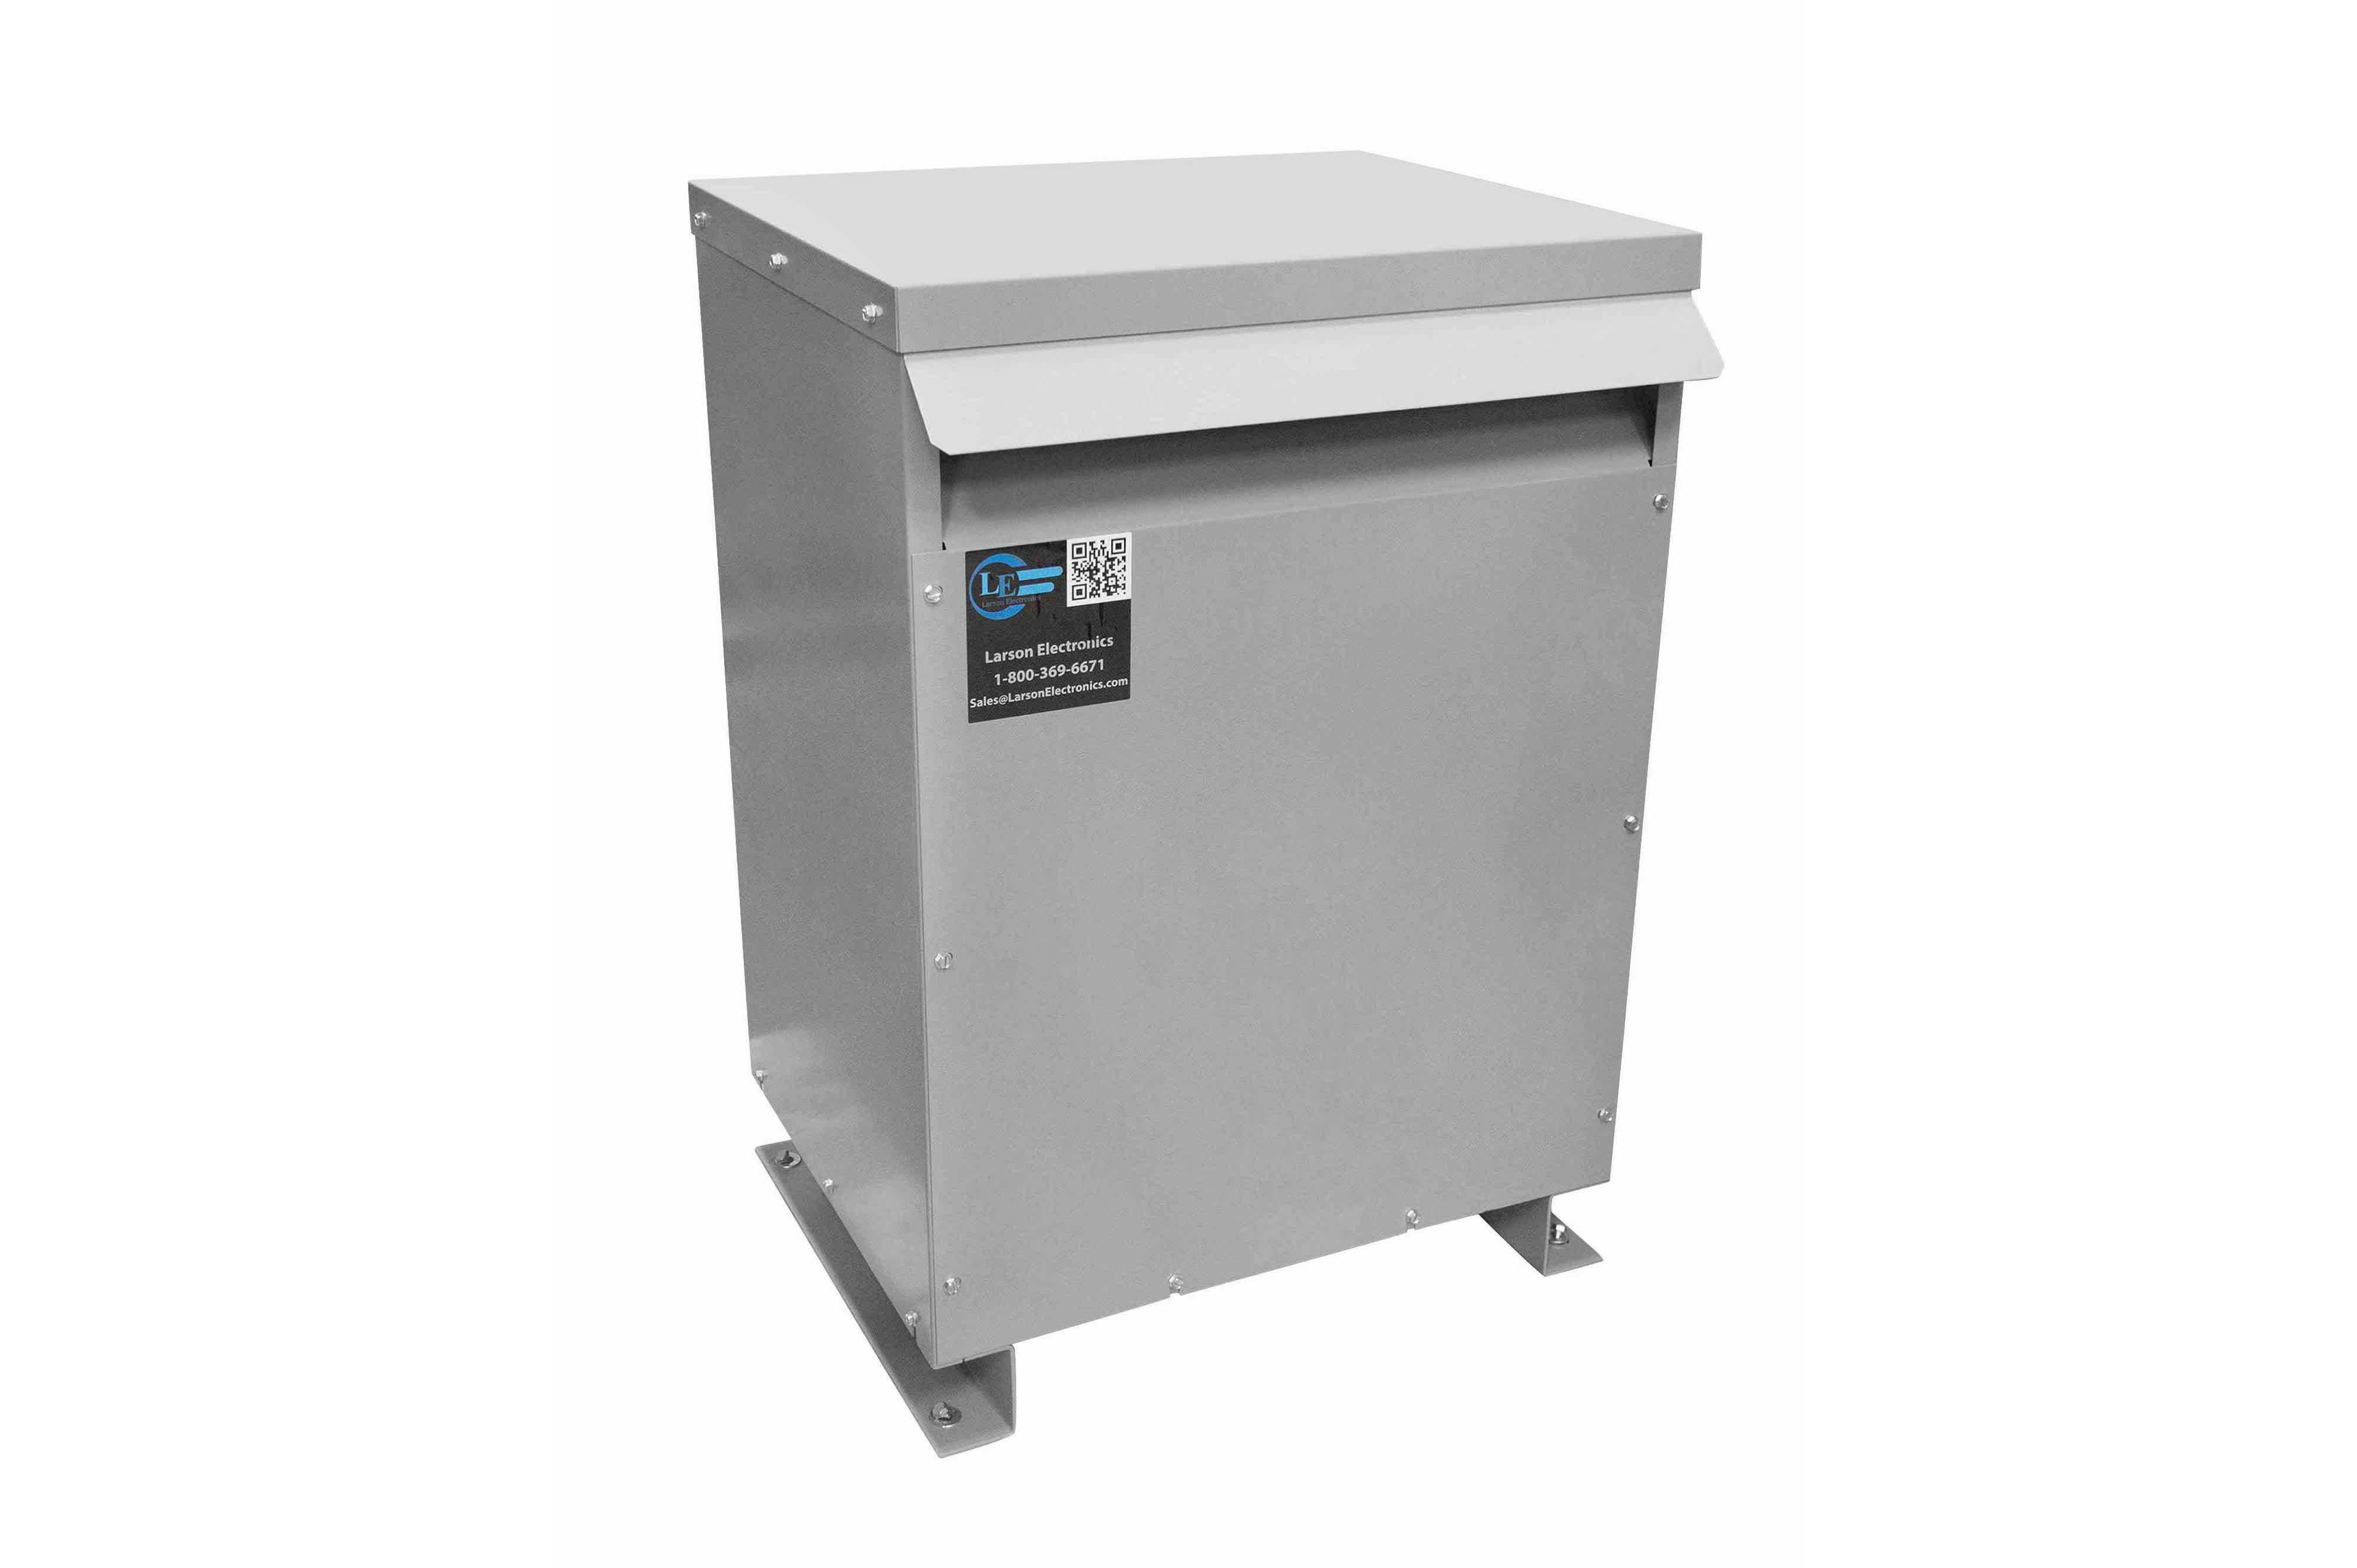 800 kVA 3PH Isolation Transformer, 575V Wye Primary, 400V Delta Secondary, N3R, Ventilated, 60 Hz